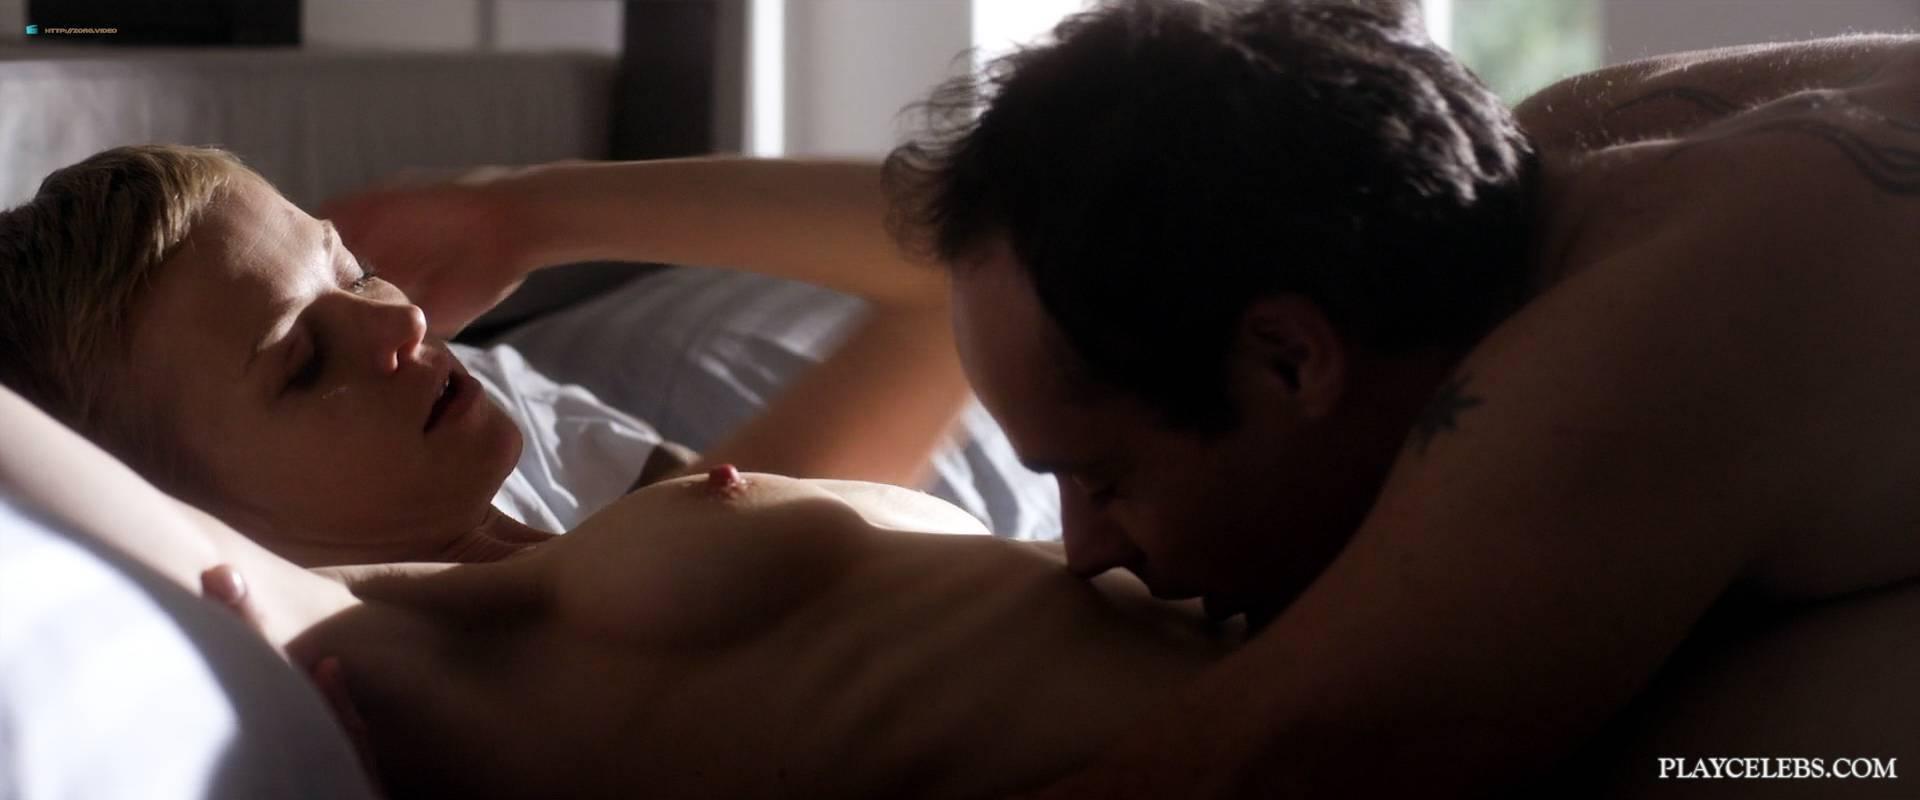 Actress Constance Brenneman Nude Sex Scene From Night Eyes (2014)